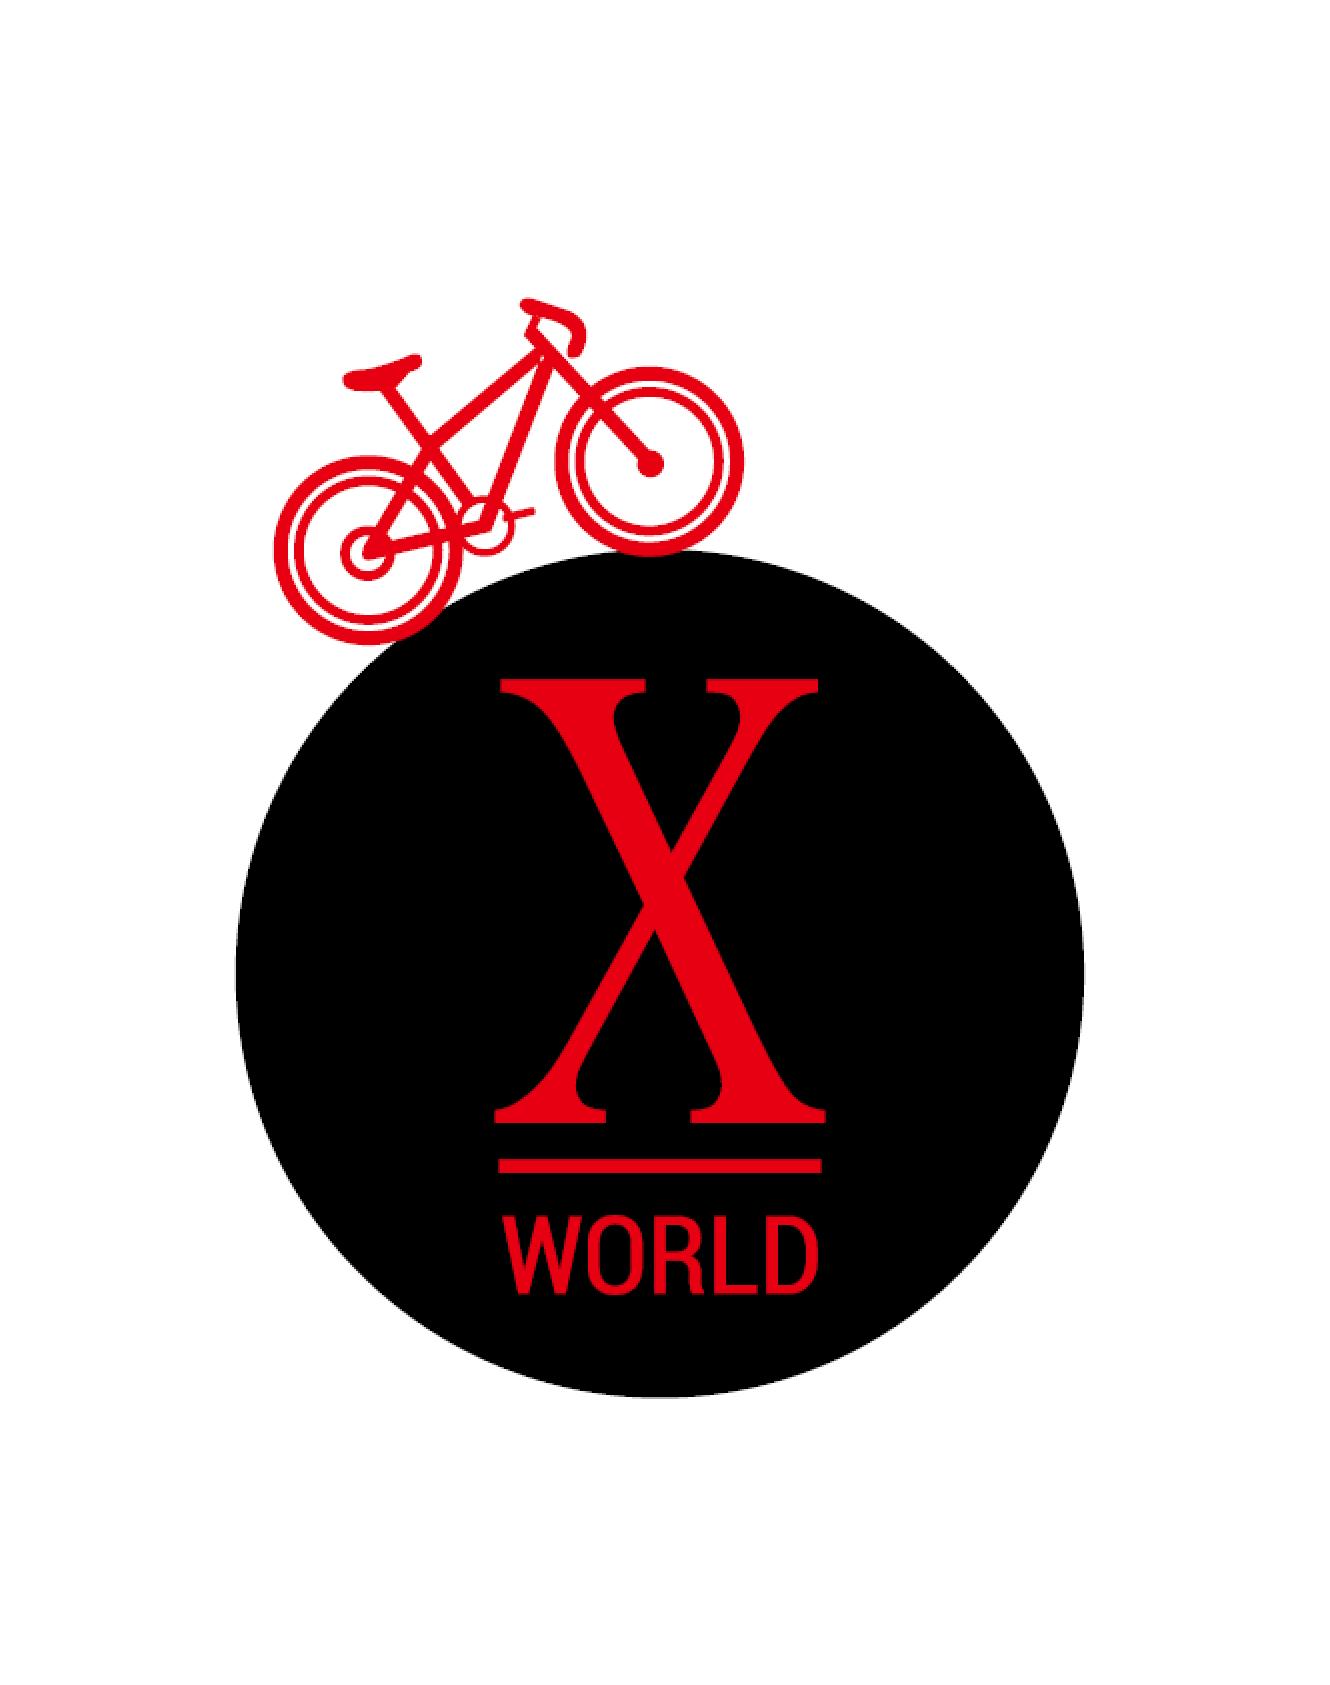 CHANGZHOU ONE WORLD INTERNATIONAL TRADE CO., LTD